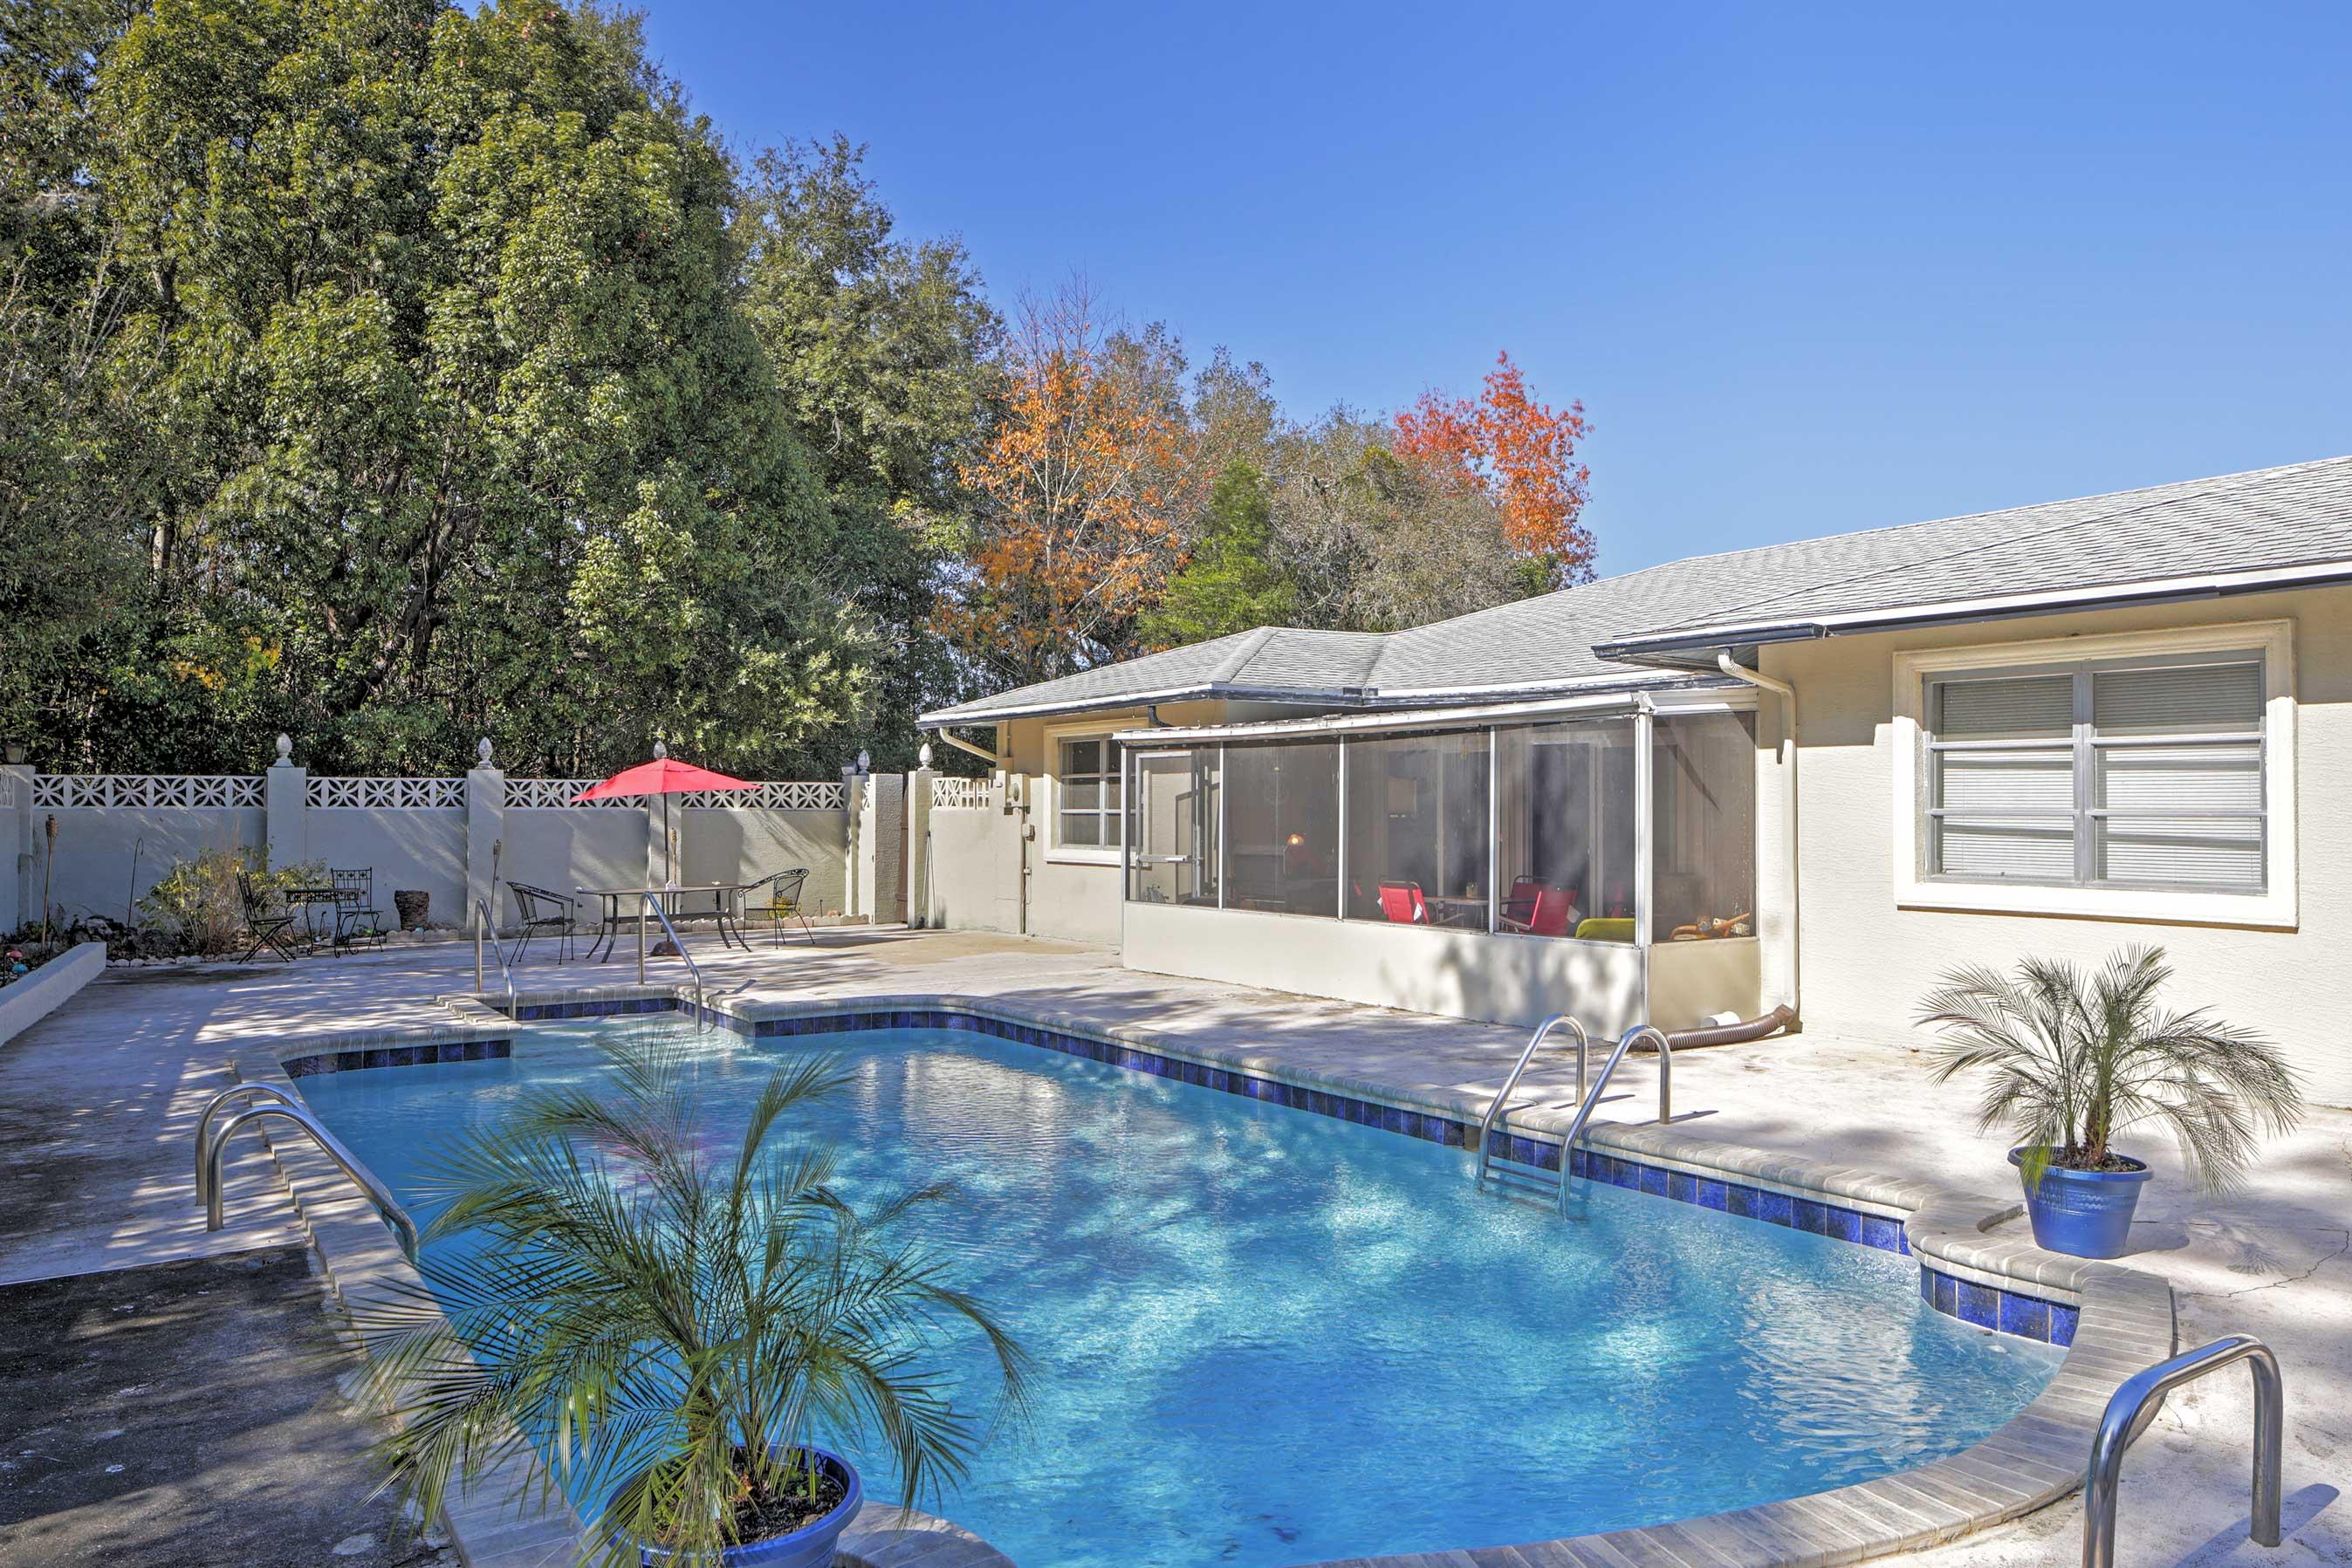 Citrus Springs Vacation Rental | 4BR | 2BA | Single Story | 1,700 Sq Ft